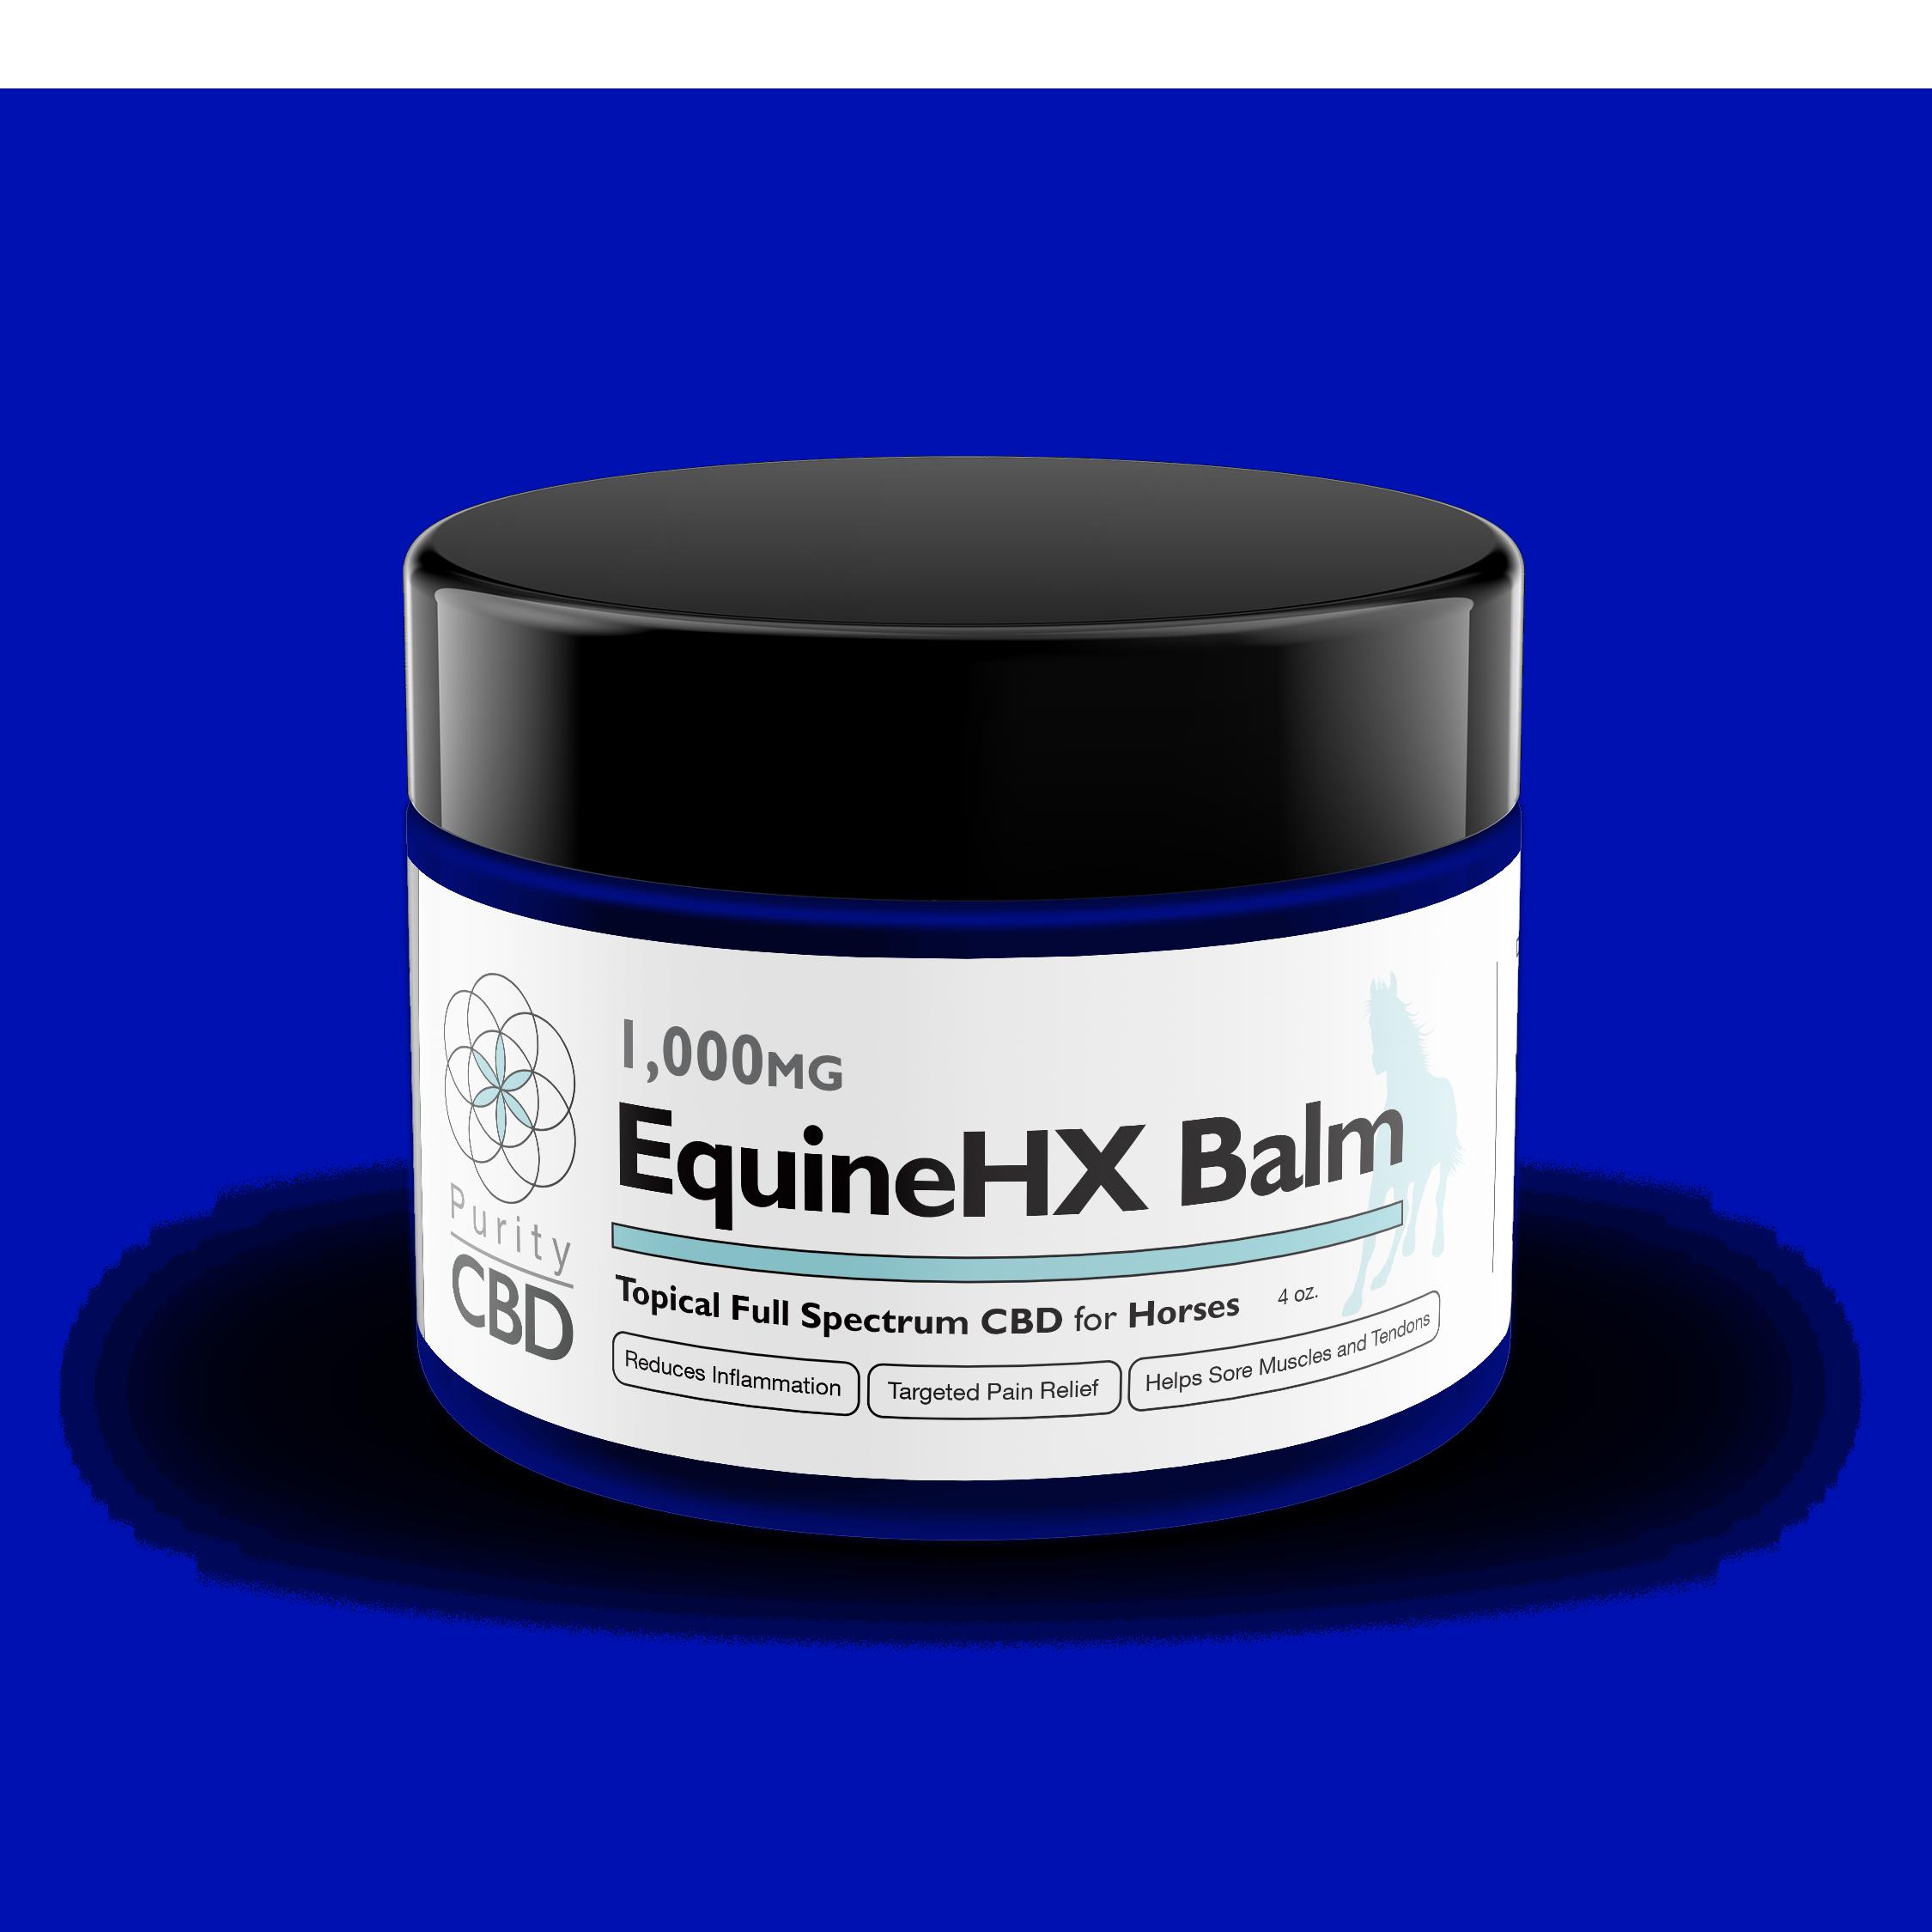 Equine HX™ CBD Balm for Horses (1000mg)